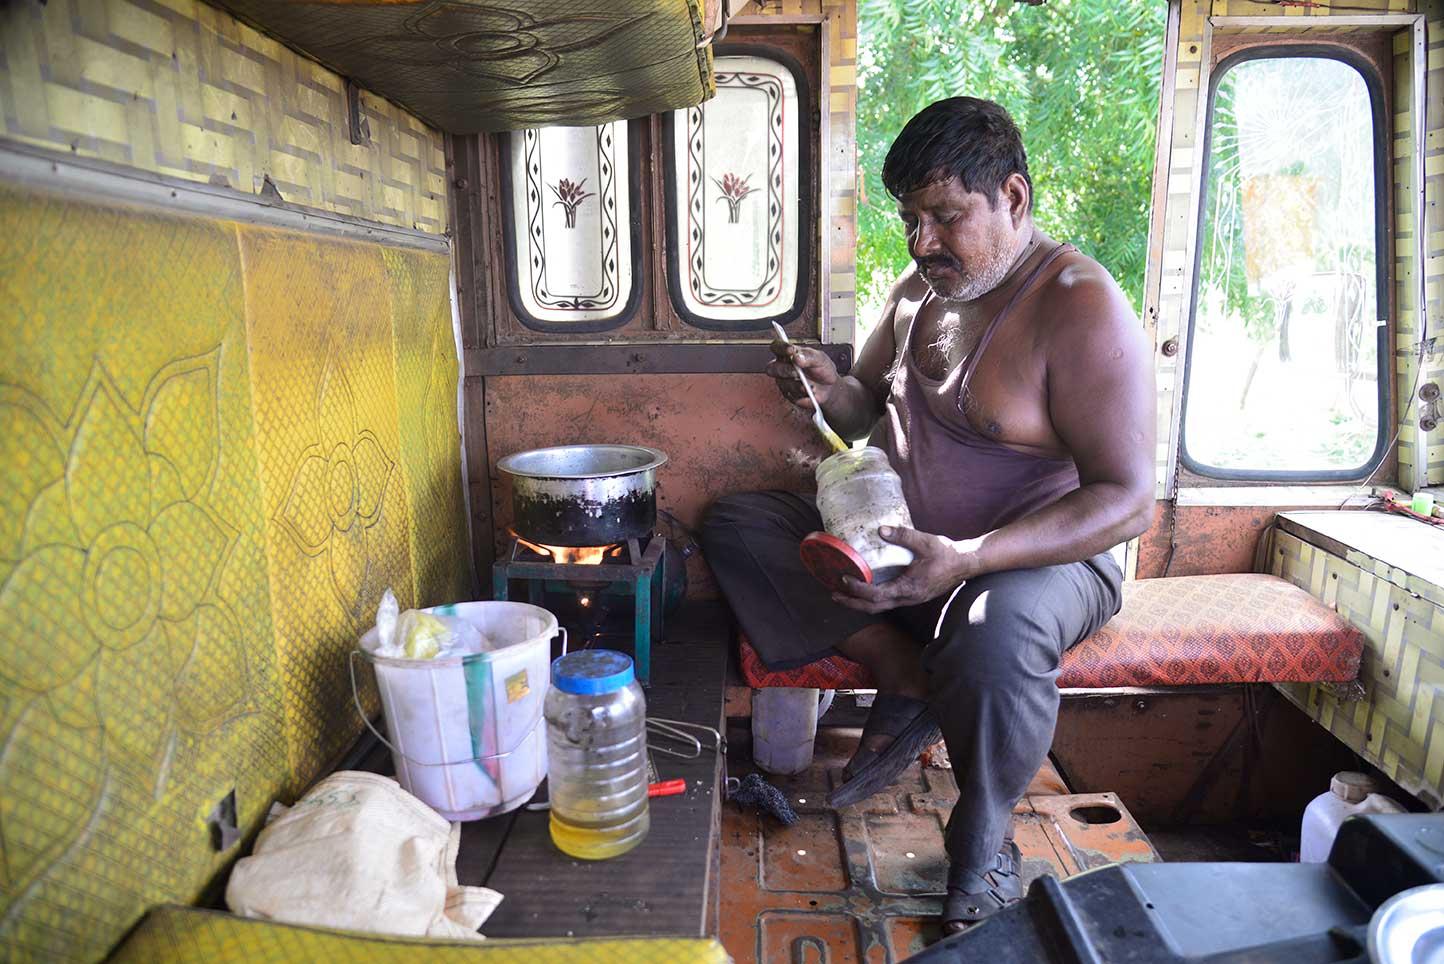 मुक्काम : कुर्नूल चेकनाका, राज्य आंध्र प्रदेश